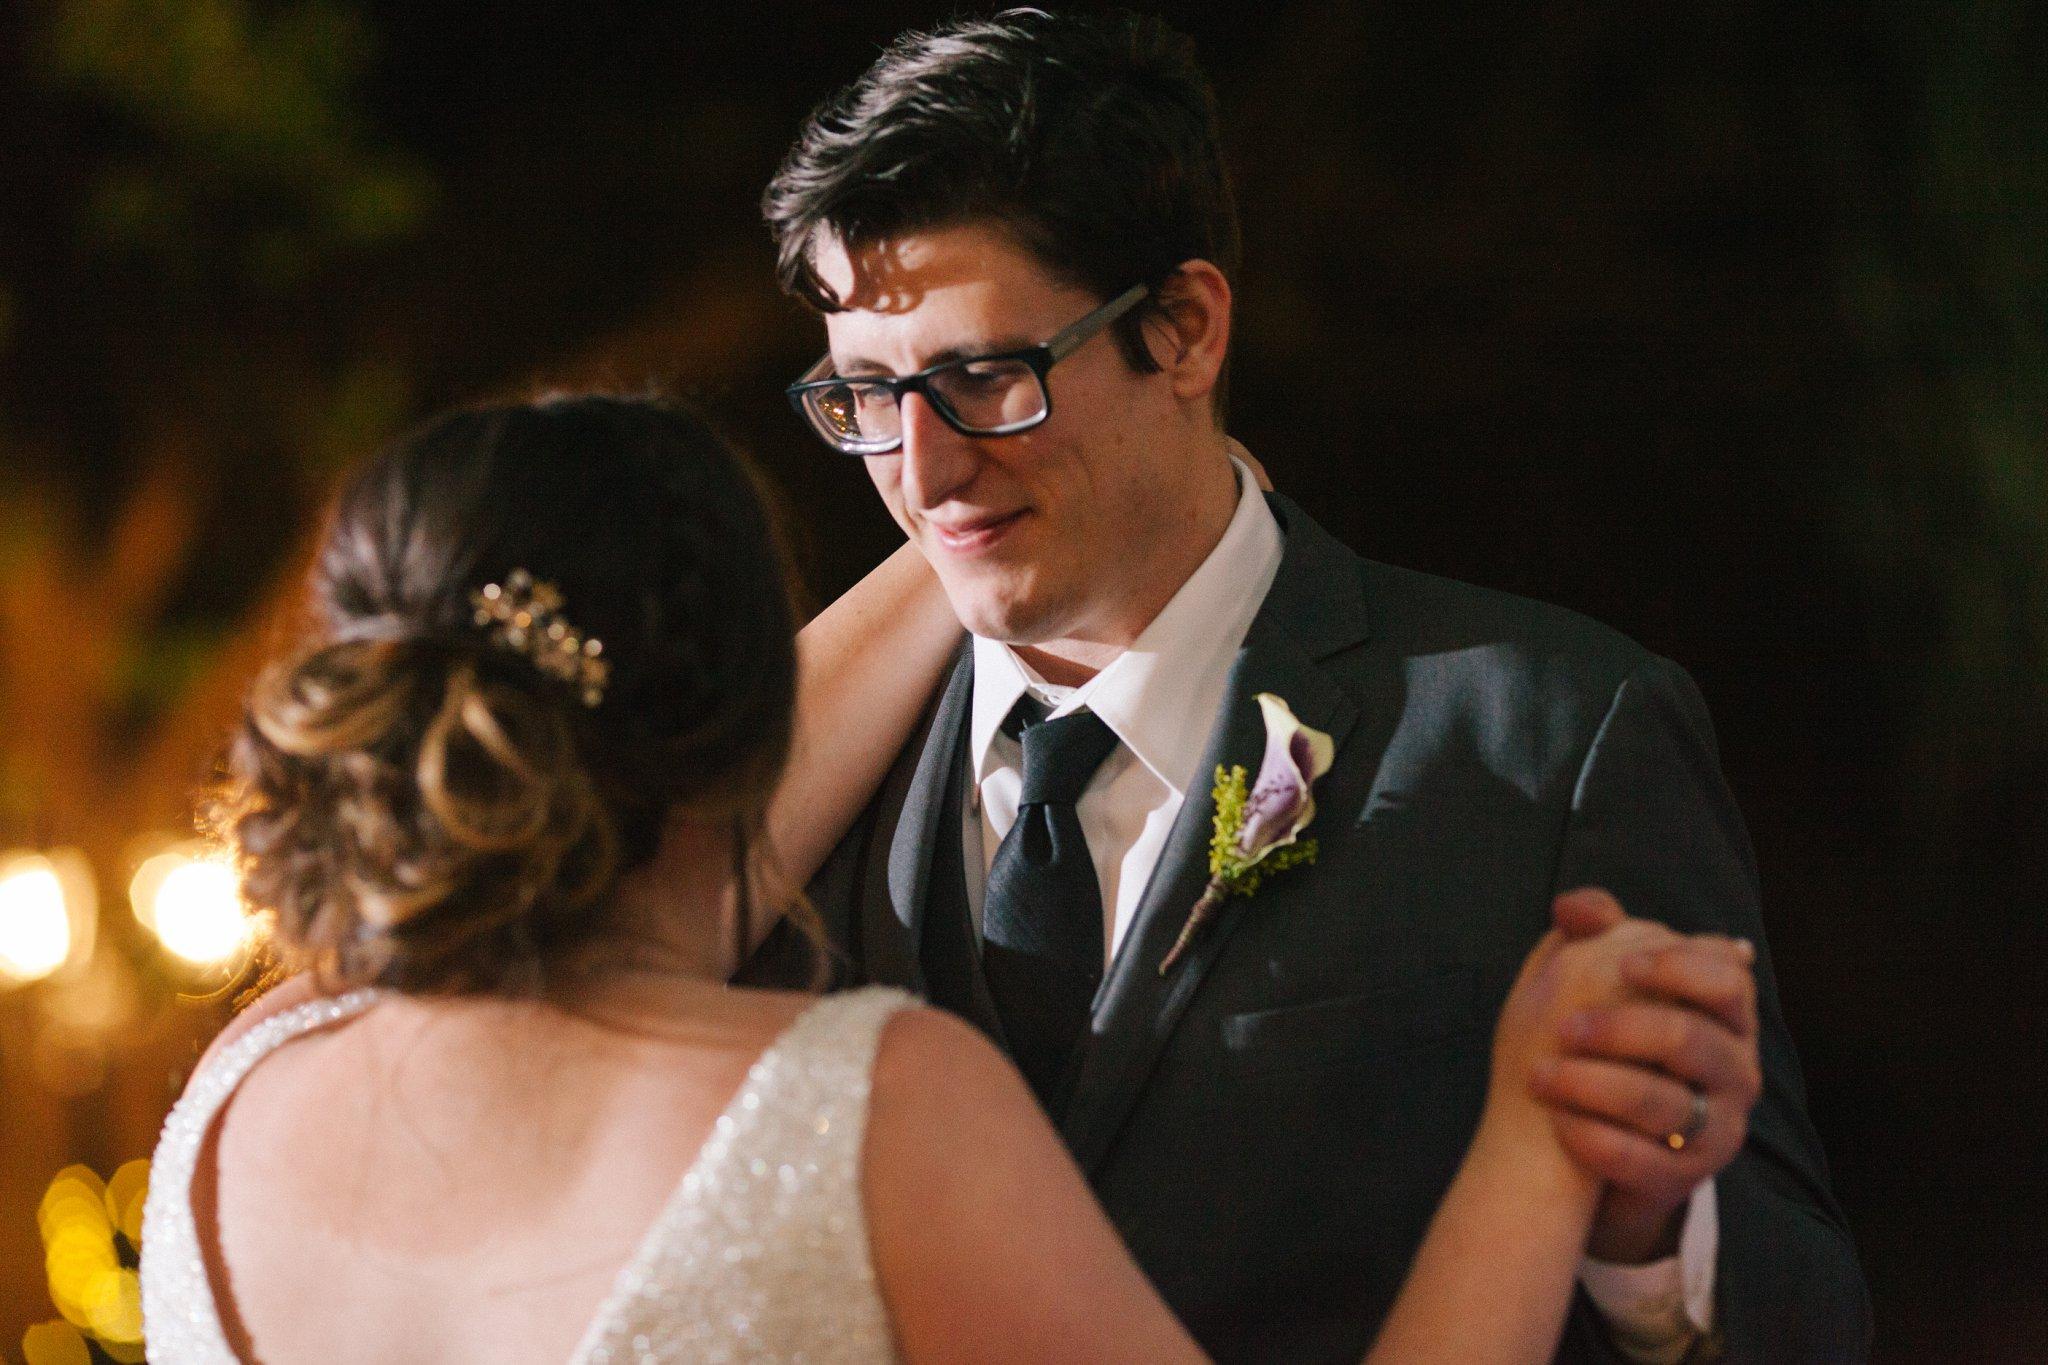 bride & groom first dance at Phoenix Zoo wedding